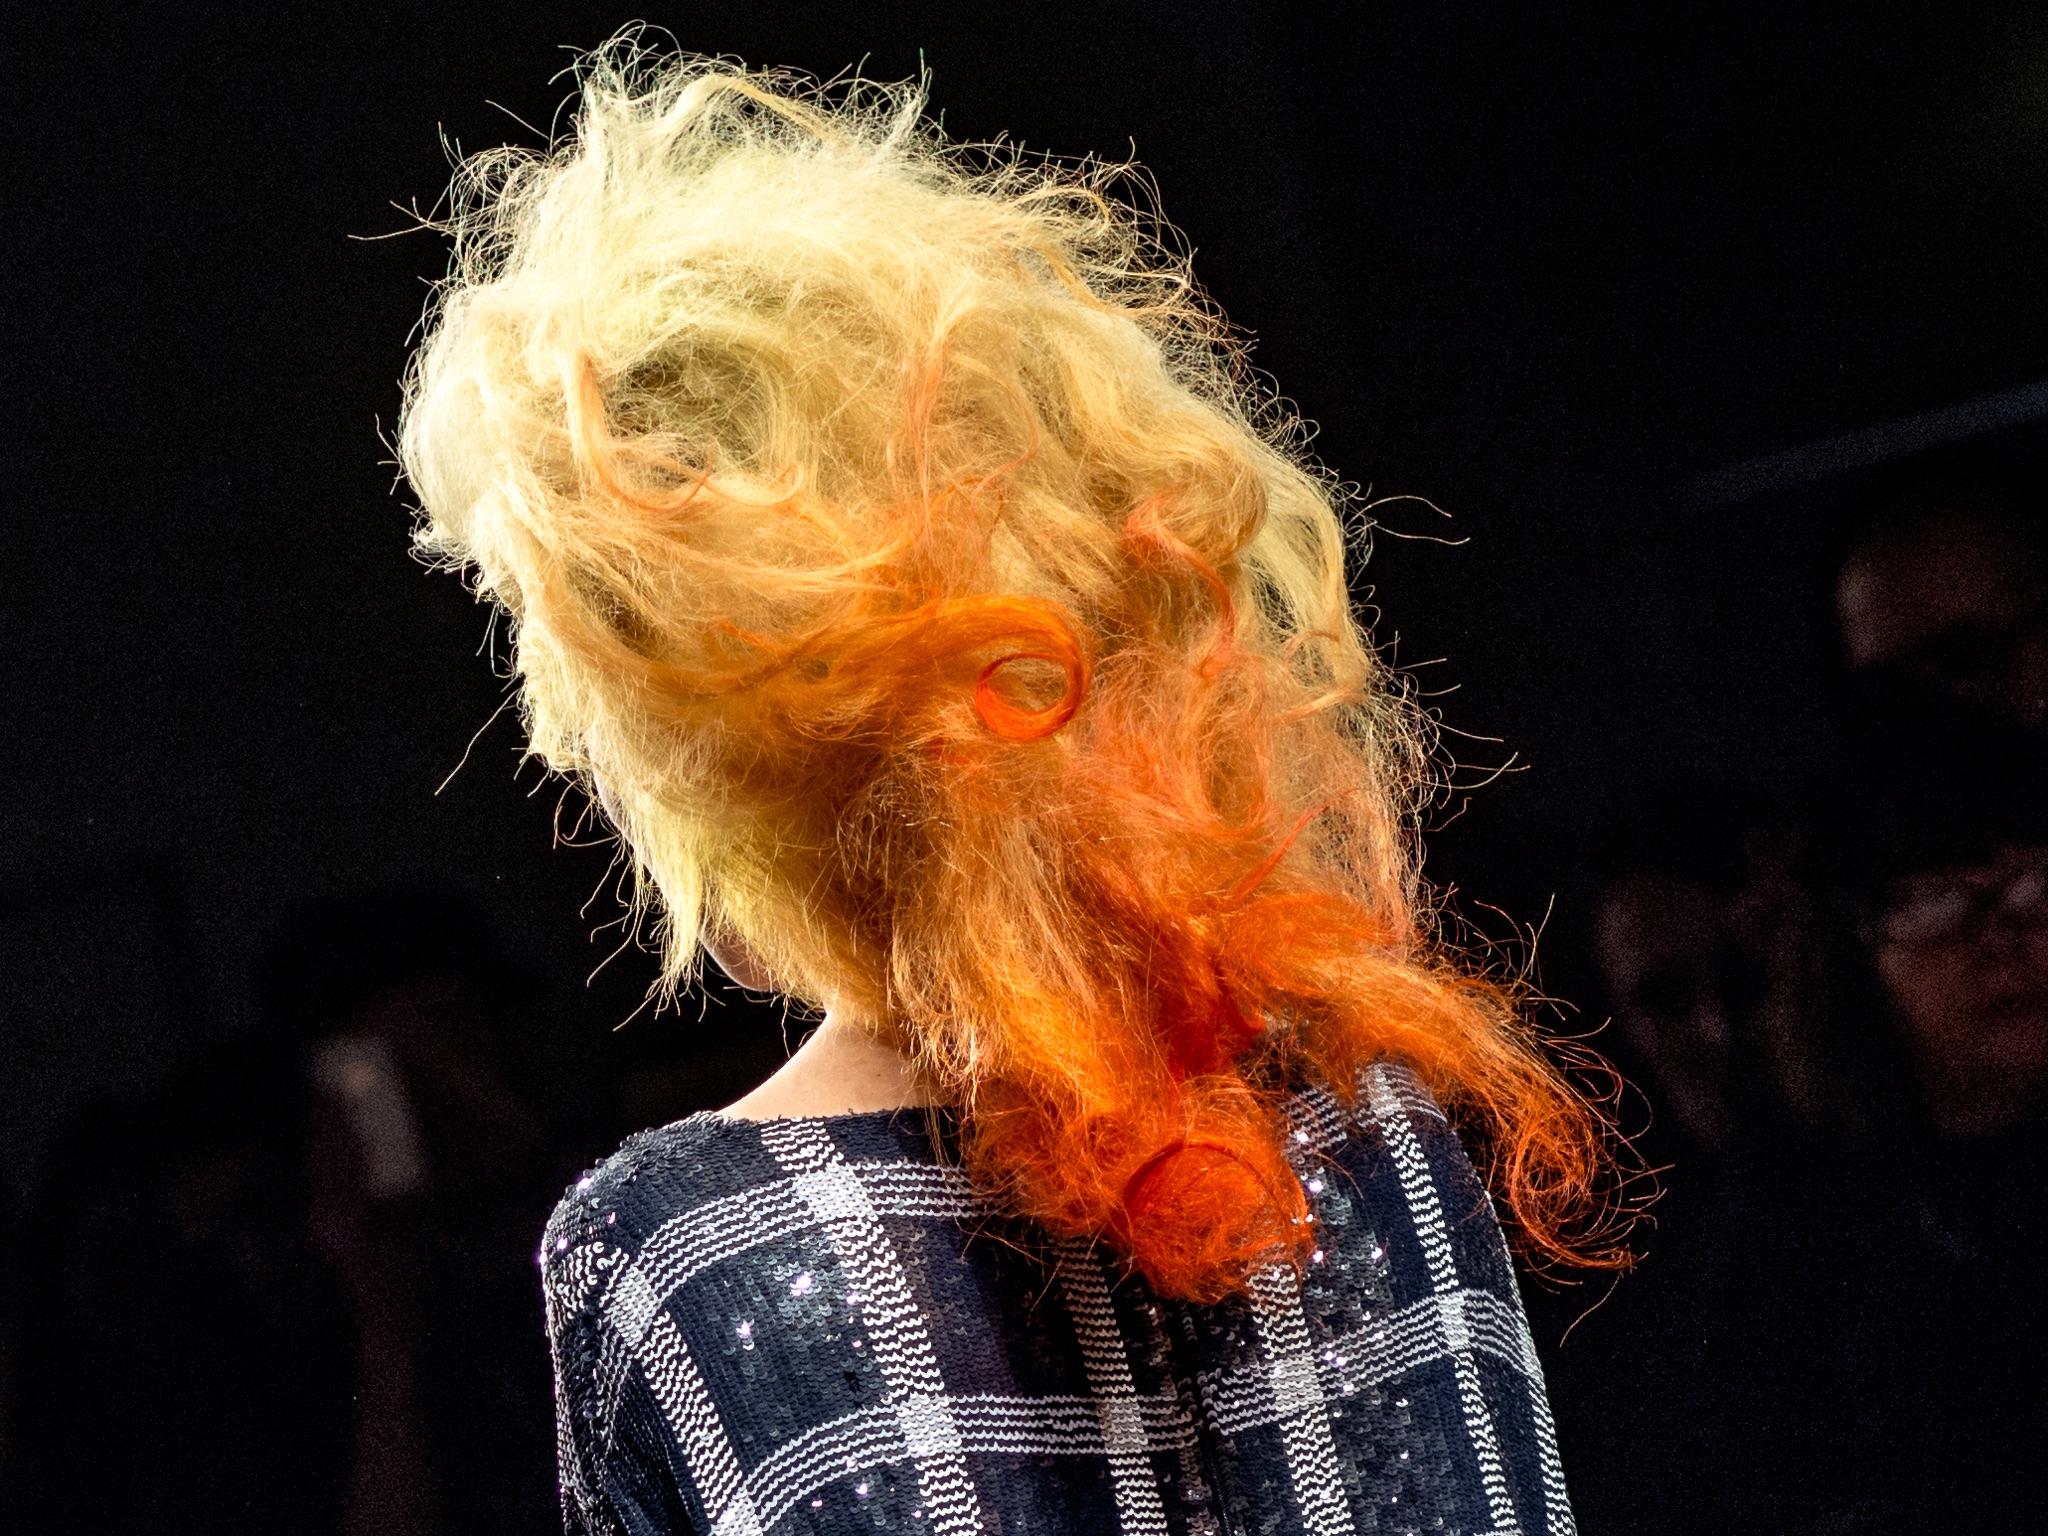 London Fashion Week LFW Runway Show Photography Photograph How to Model Walking Catwalk Youtube Video Guide Tutorial Hair Ashish